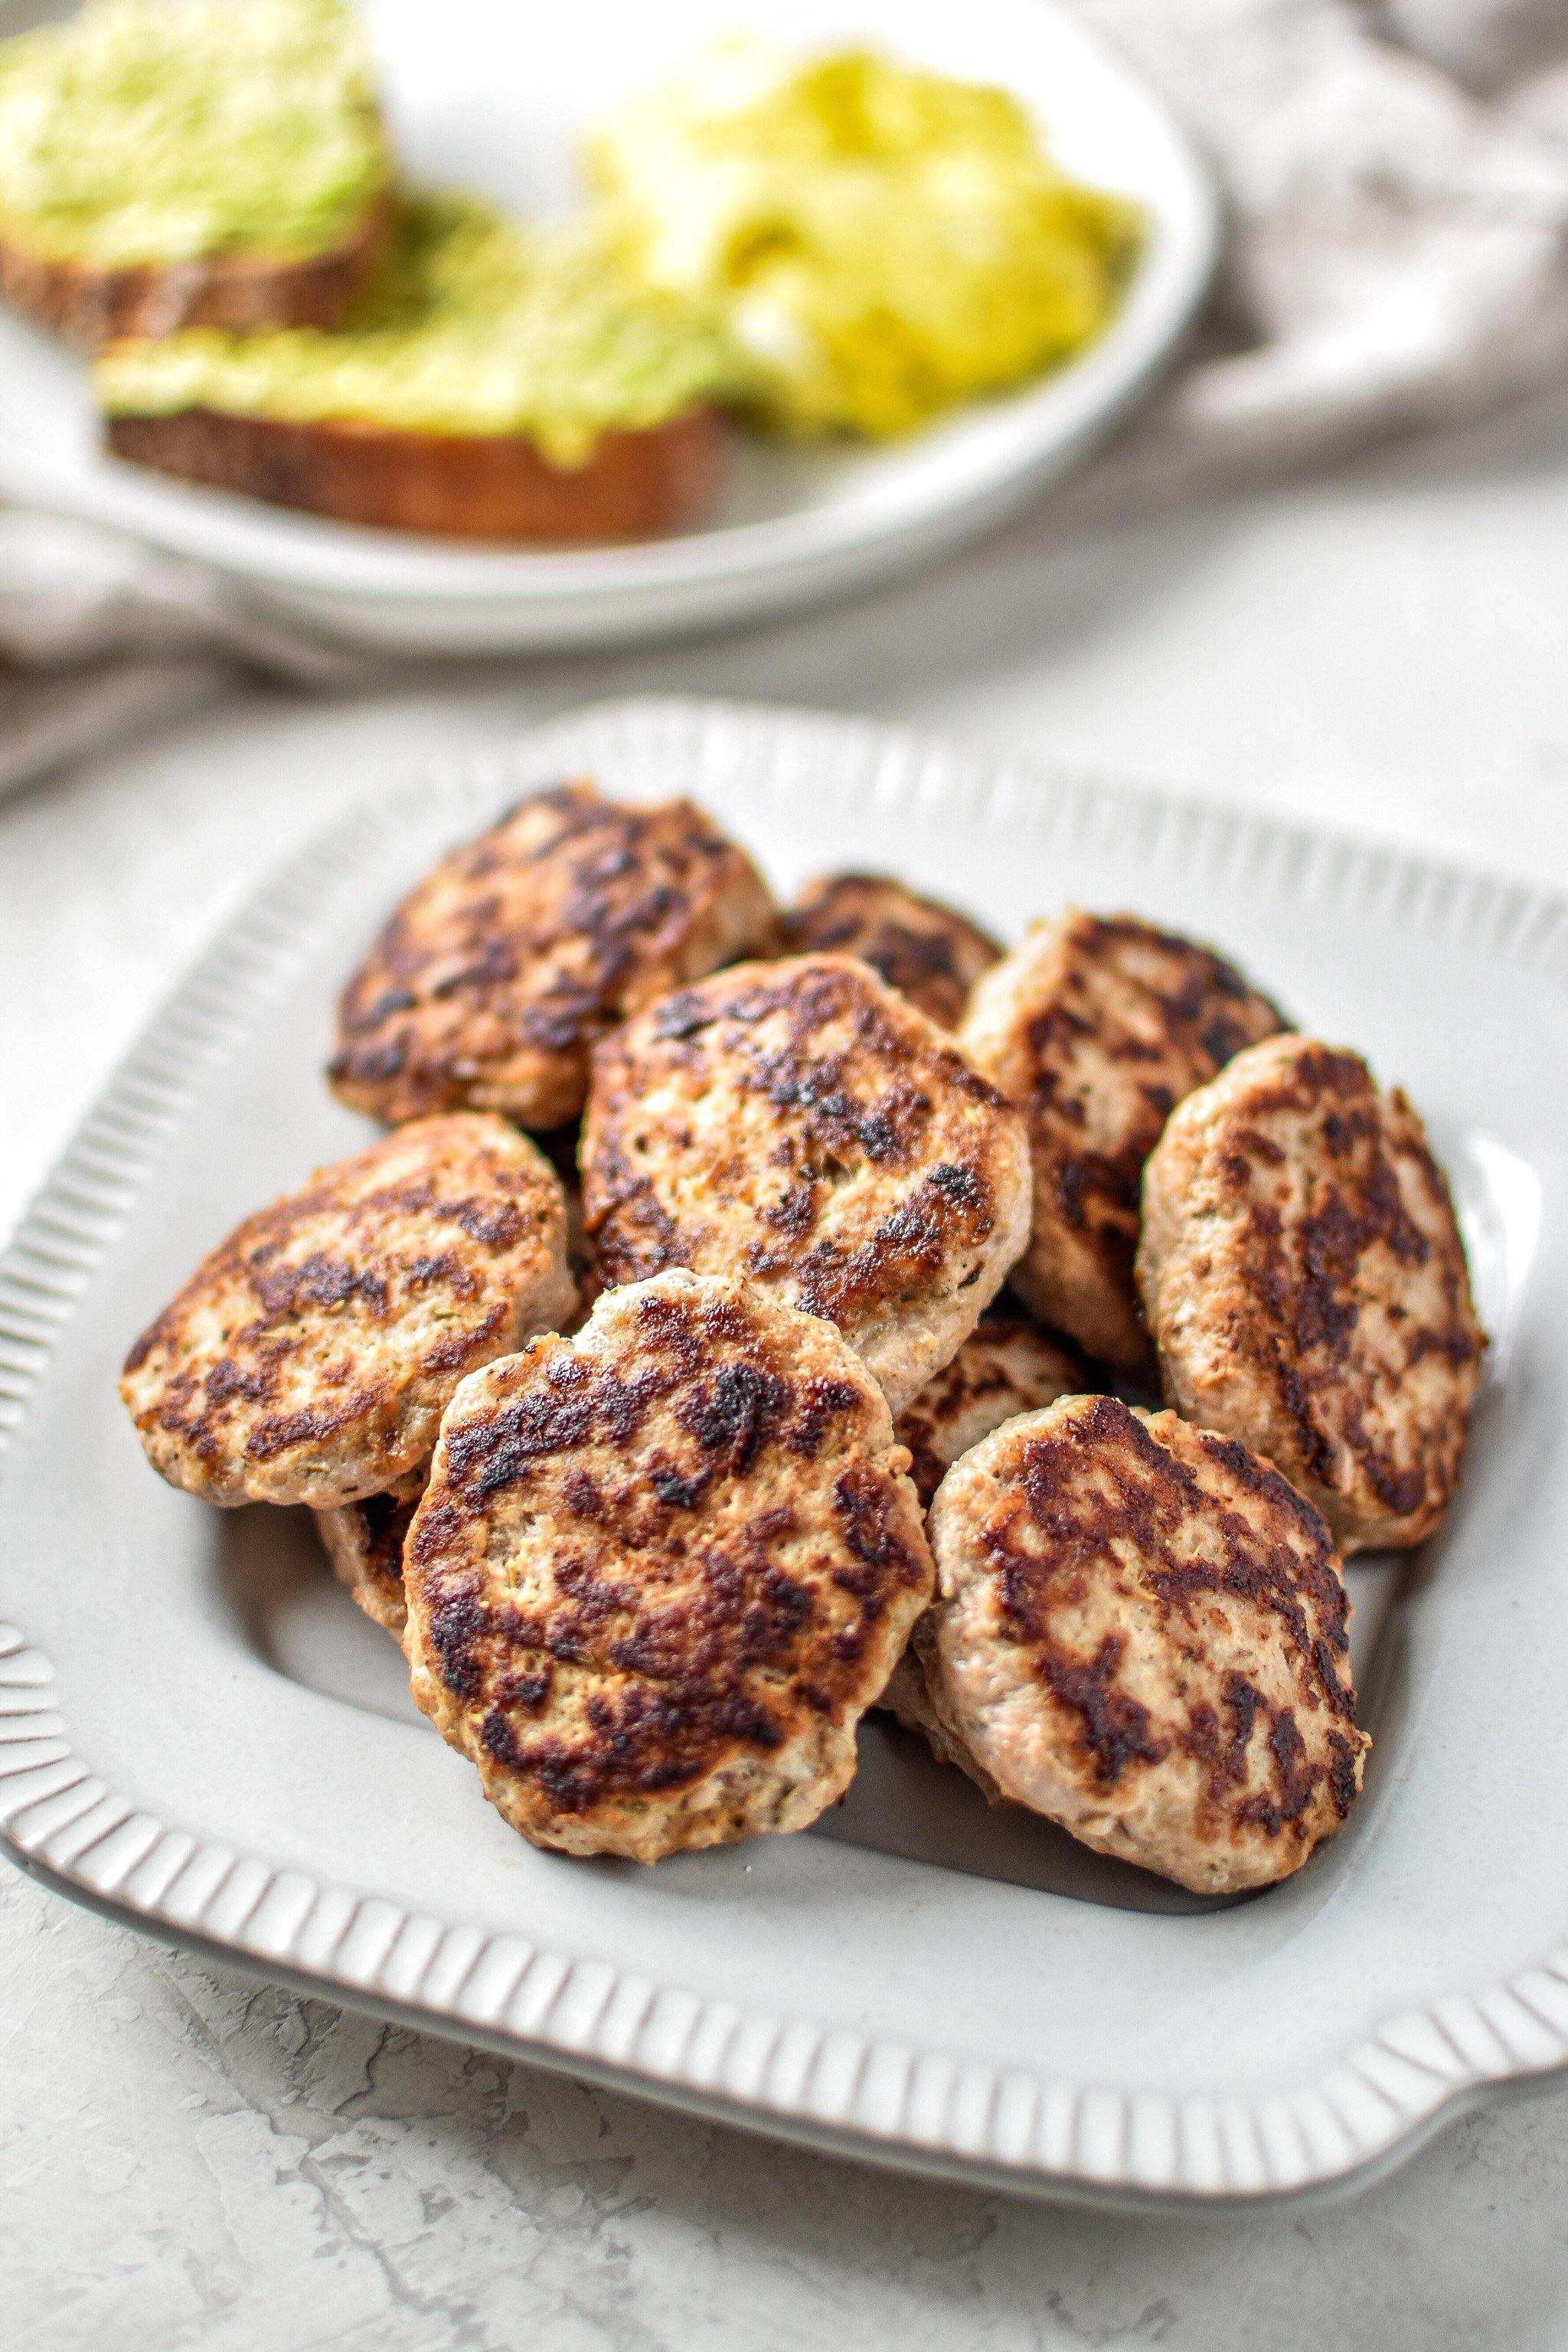 Plate of homemade ground turkey breakfast sausage patties.